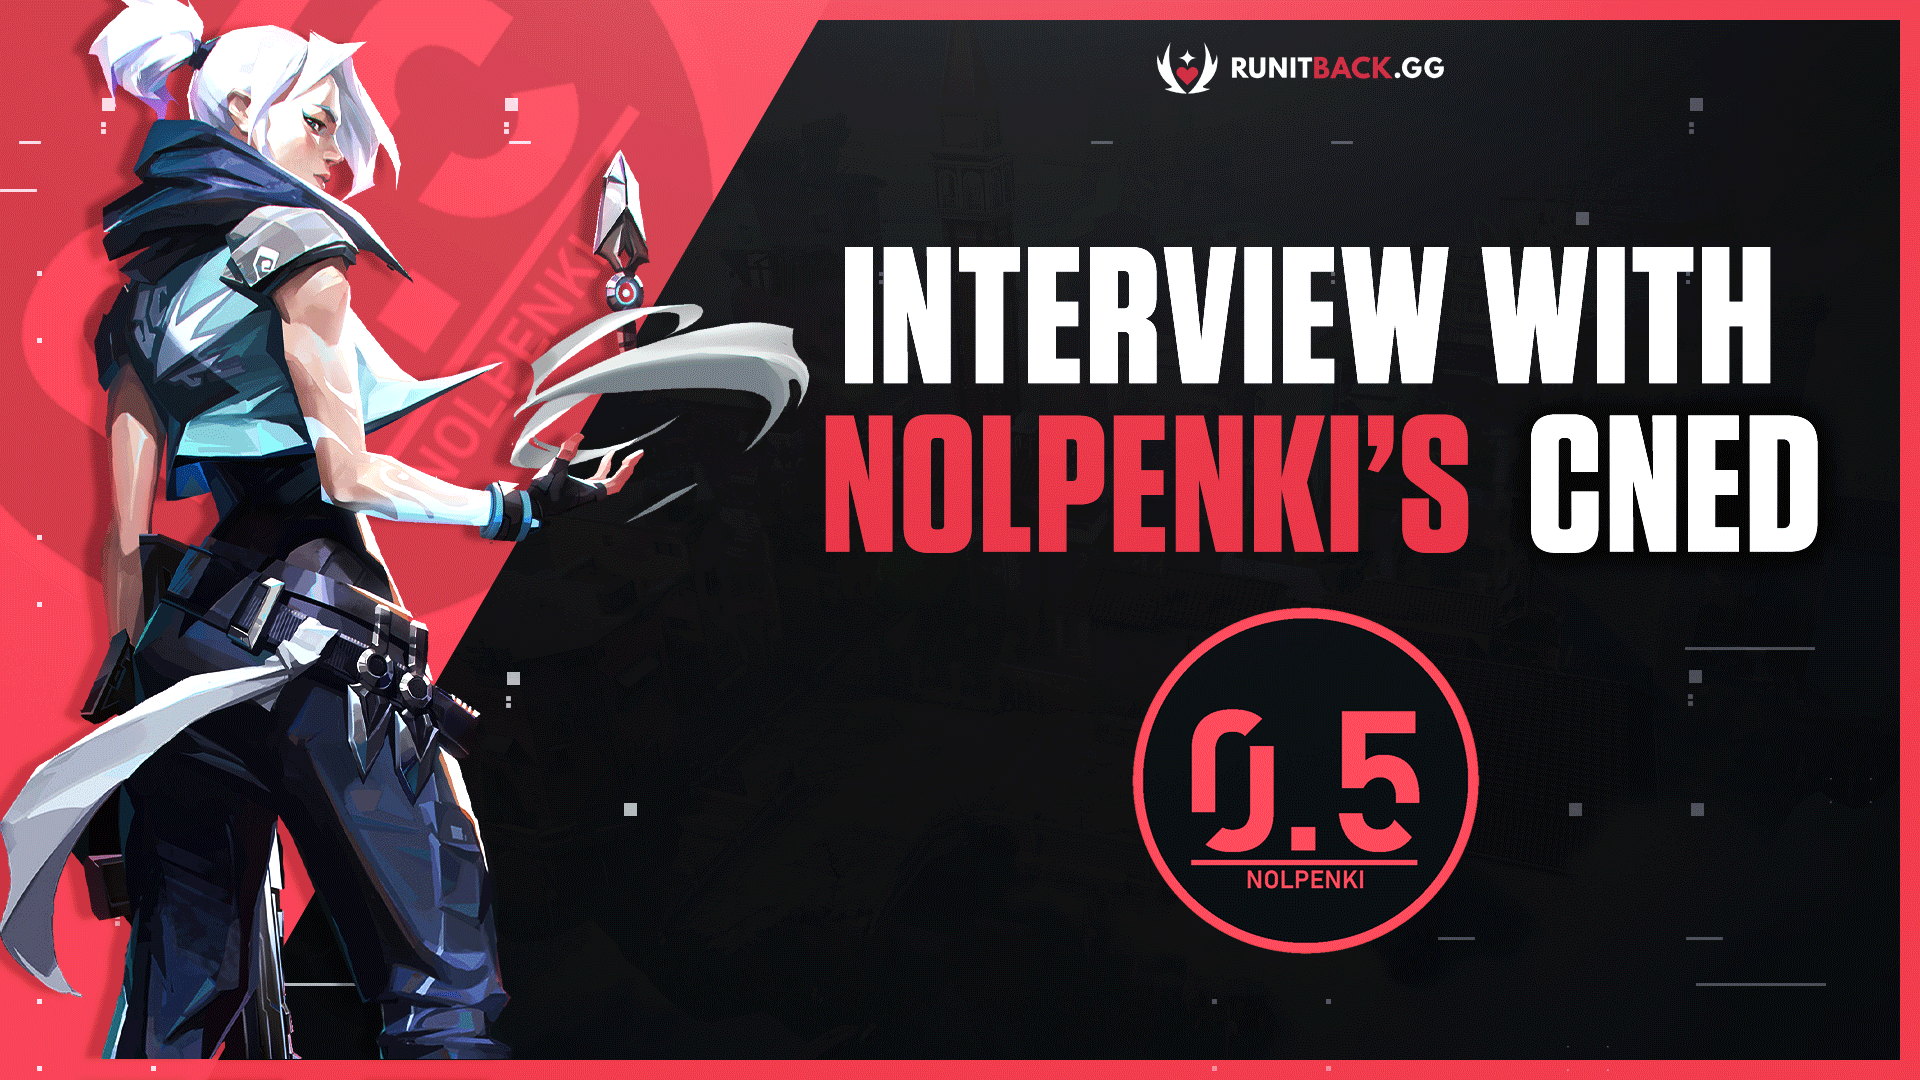 Player spotlight: nolpenki's cNed